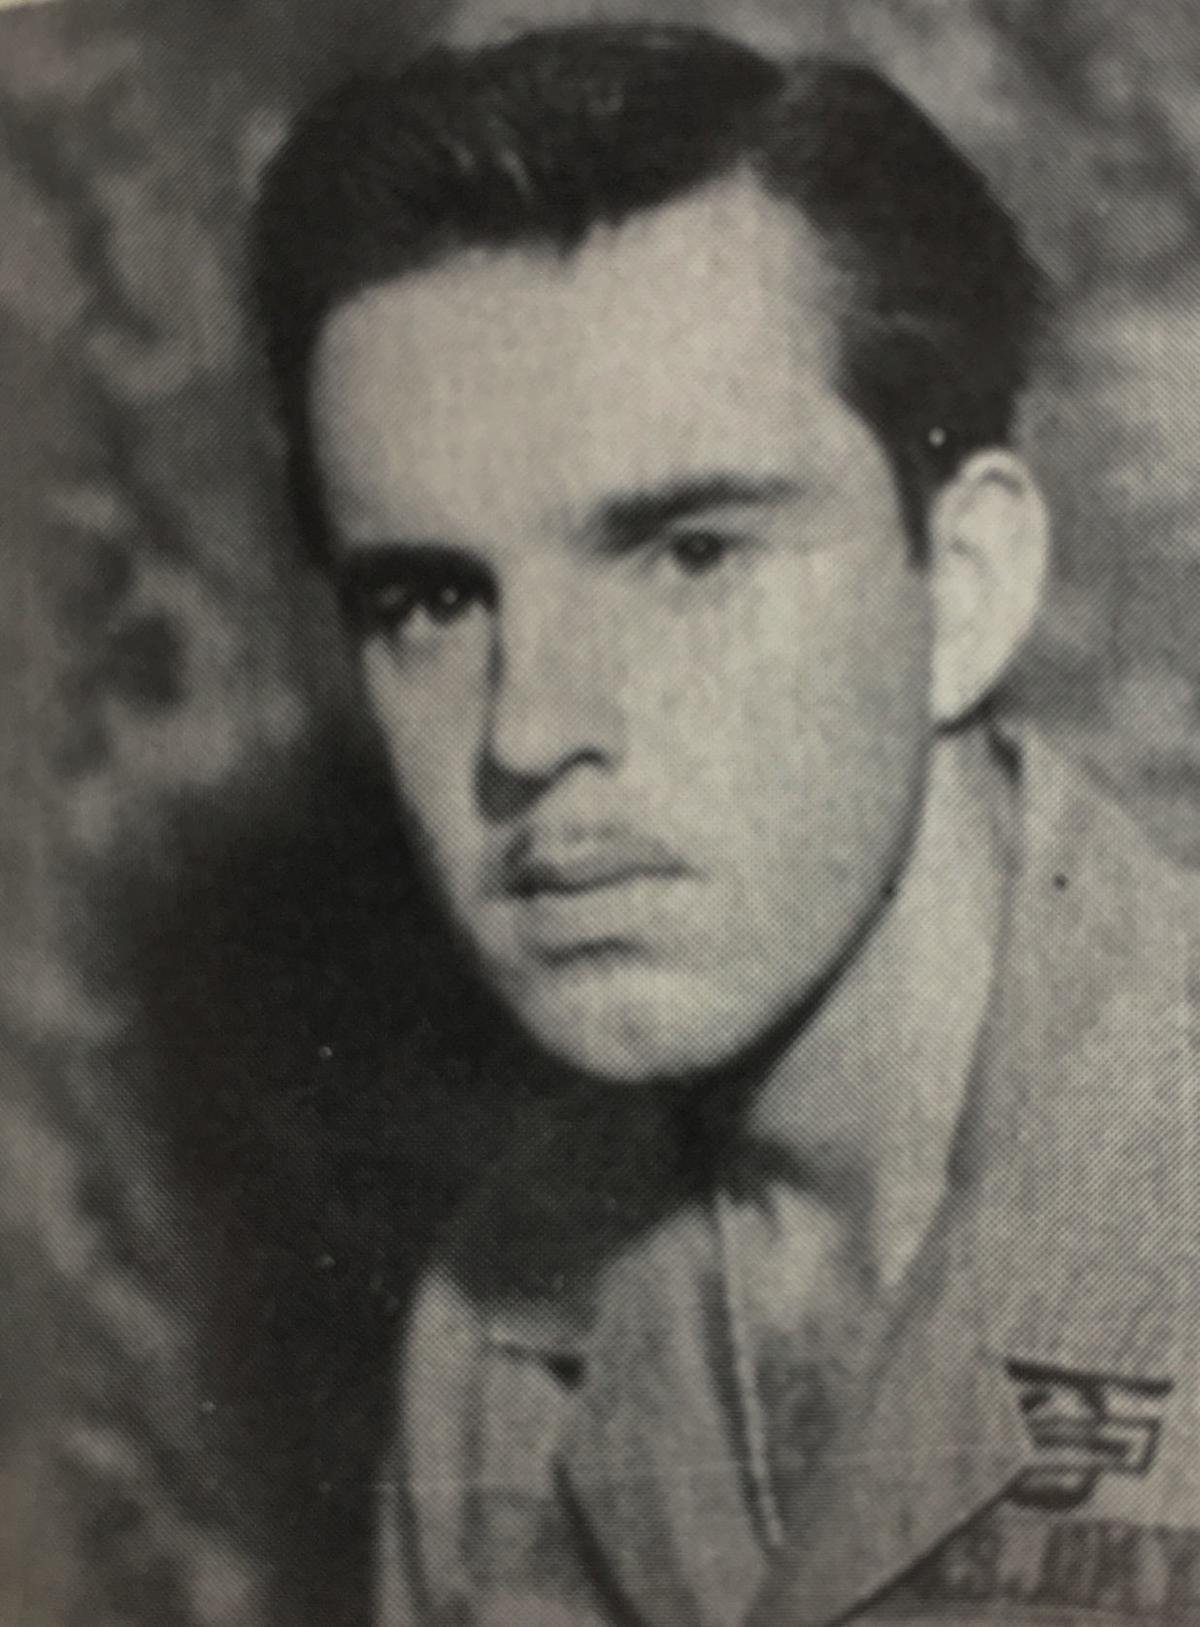 Phillip Dunaj